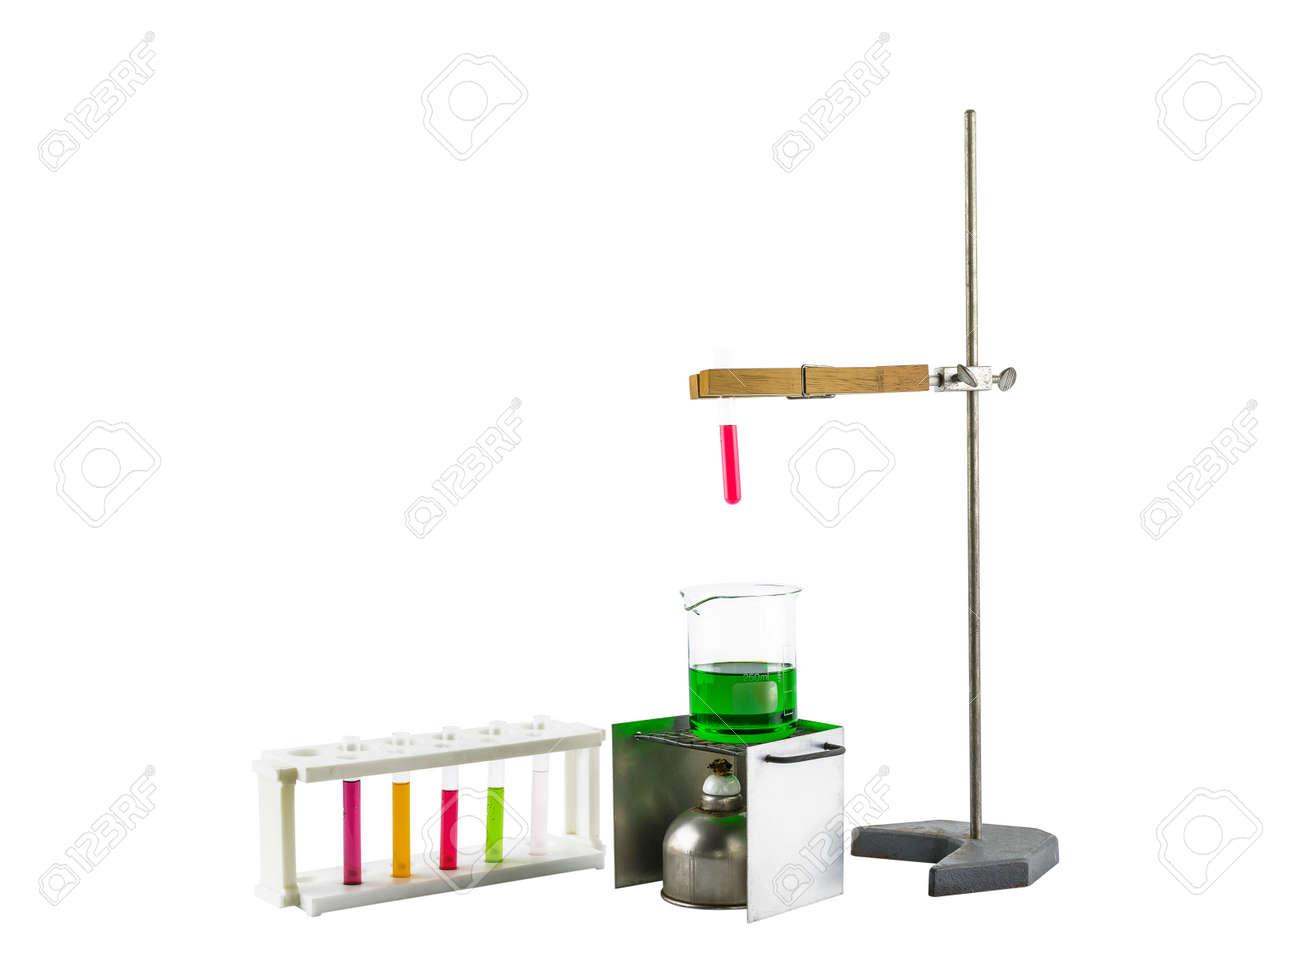 Laboratory Equipment Test Tube Holder, Clamps, Hanging, Stand And ... for Laboratory Test Tube Holder  55dqh